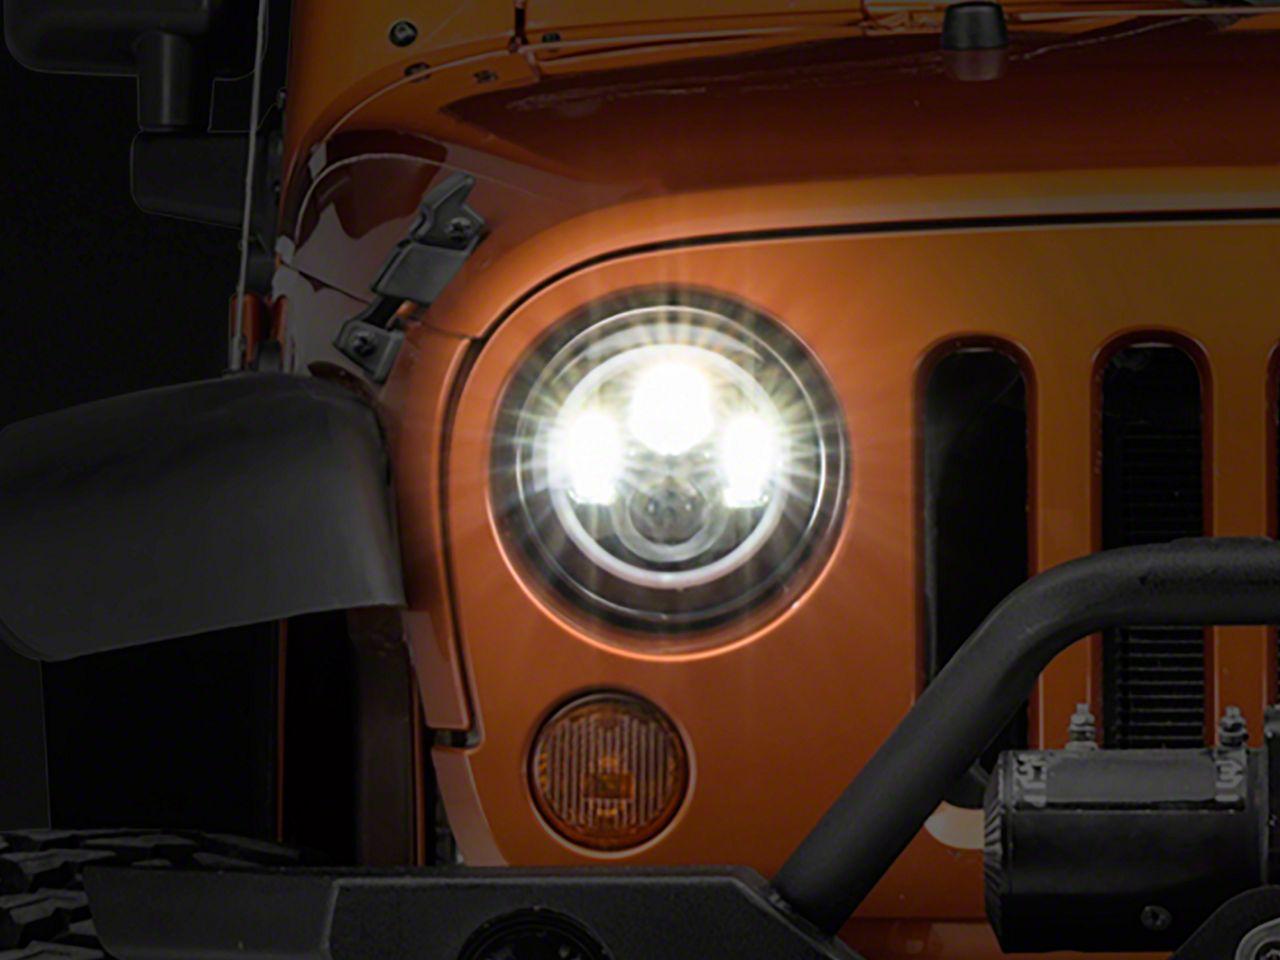 Led Halo Headlight Wiring Diagram | Wiring Diagram Octane Lighting Wiring Diagram on